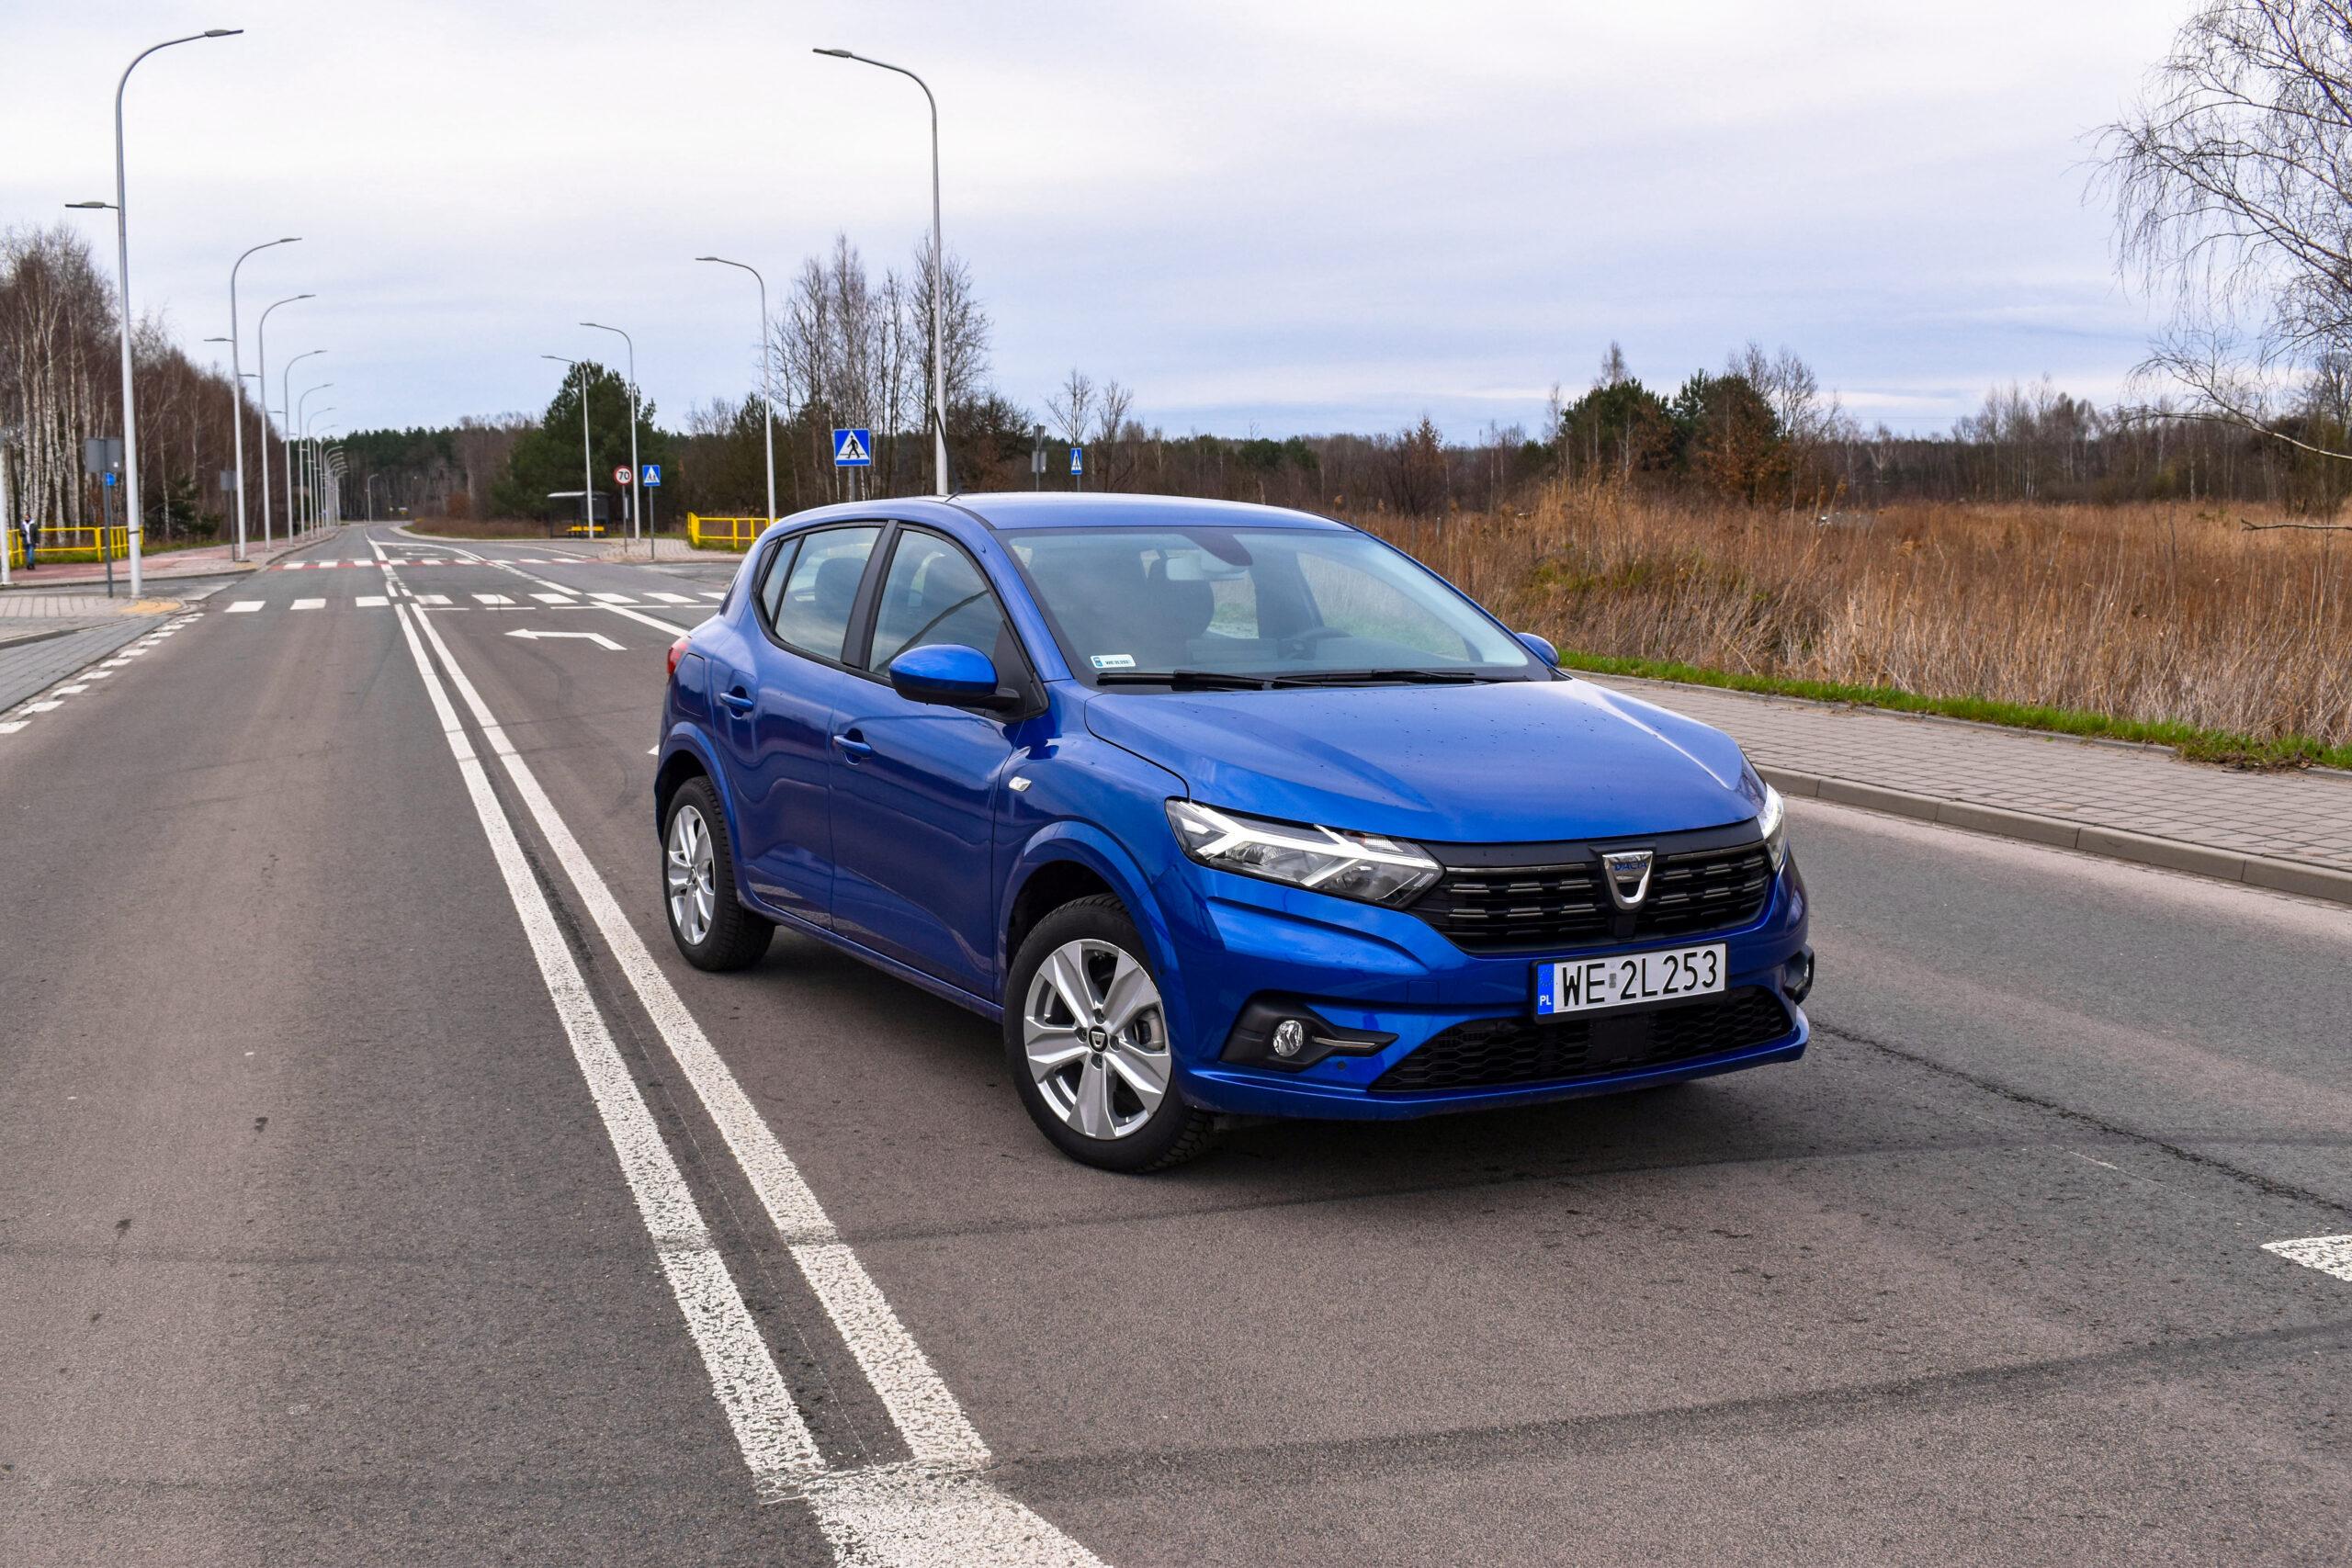 Dacia Sandero 1.0 TCe LPG COMFORT